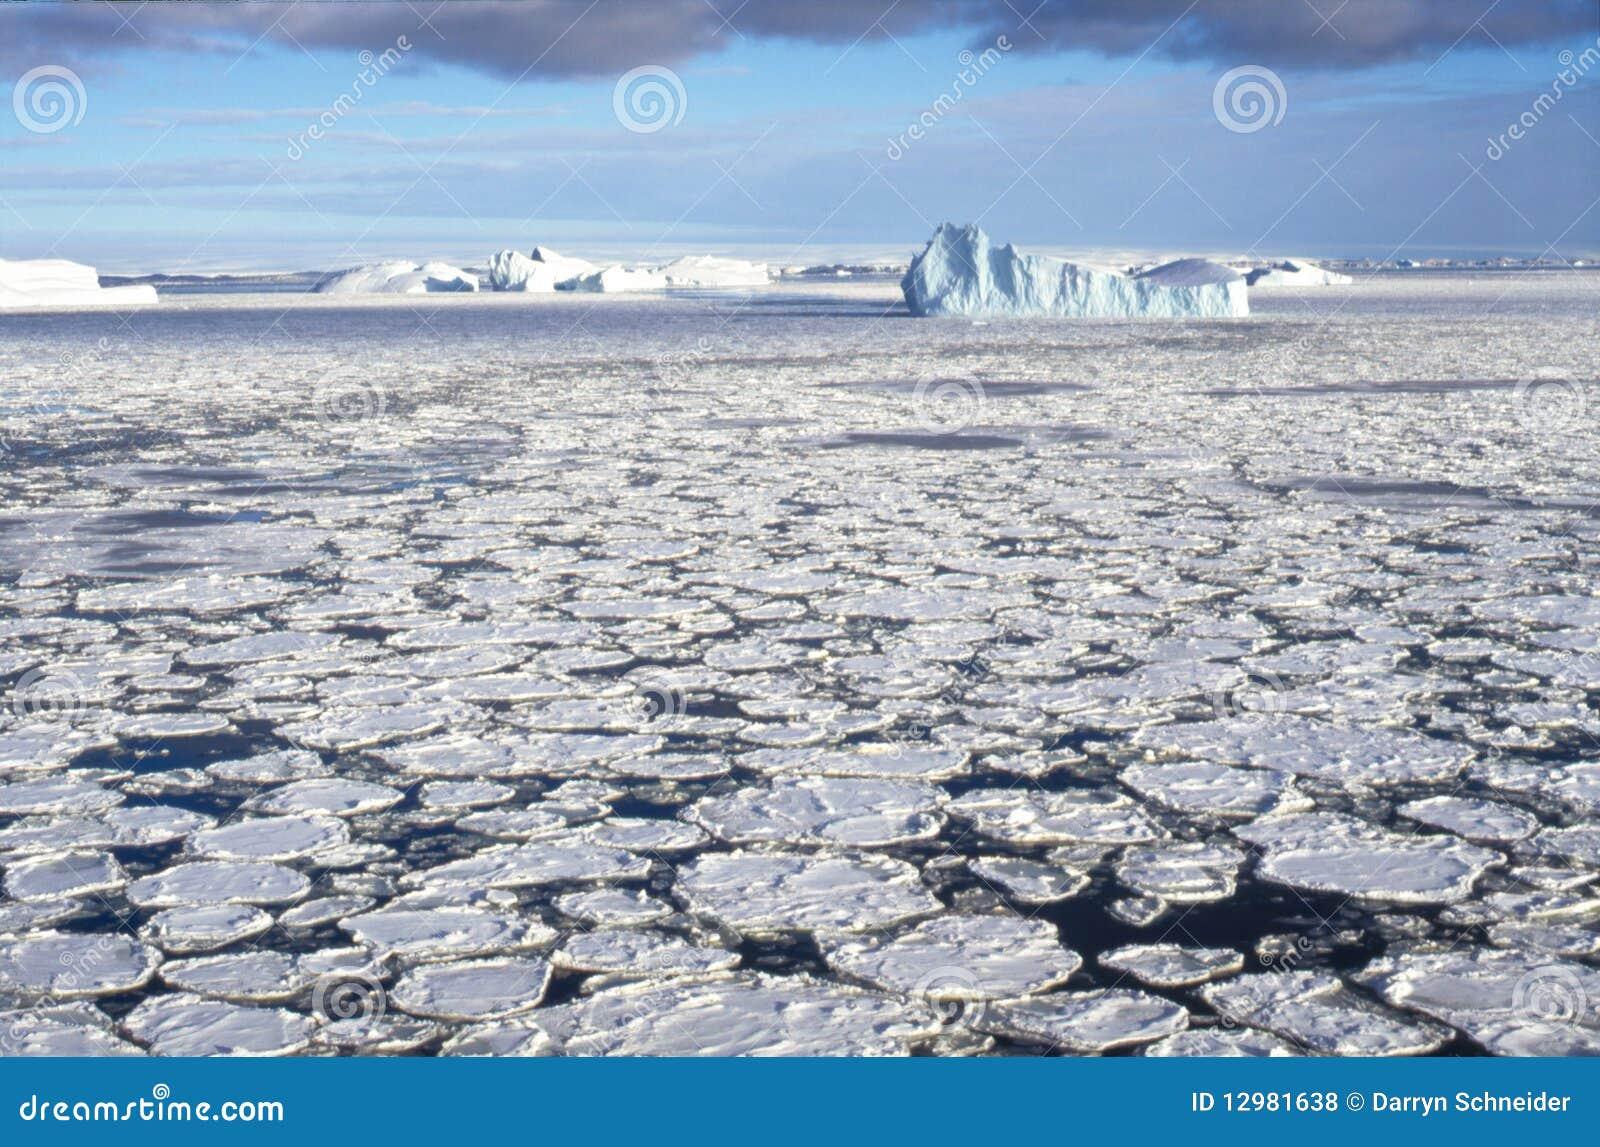 Icebergs in Sea Ice